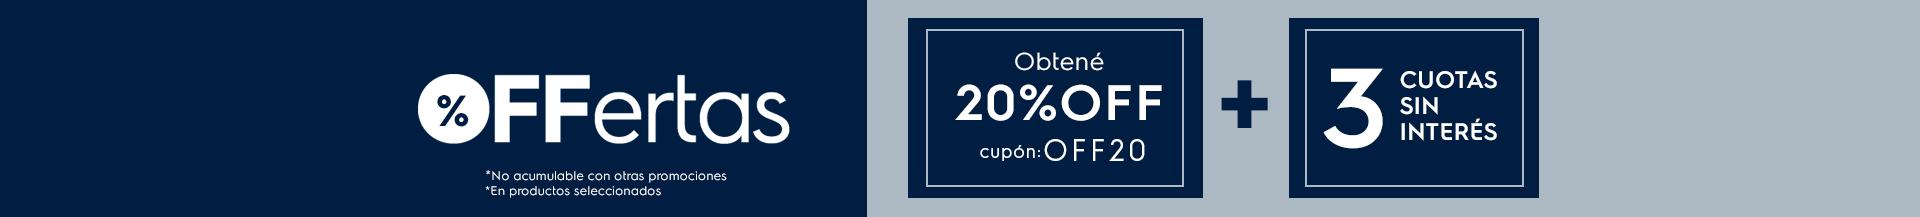 OFFertas 20% - HELADERAS